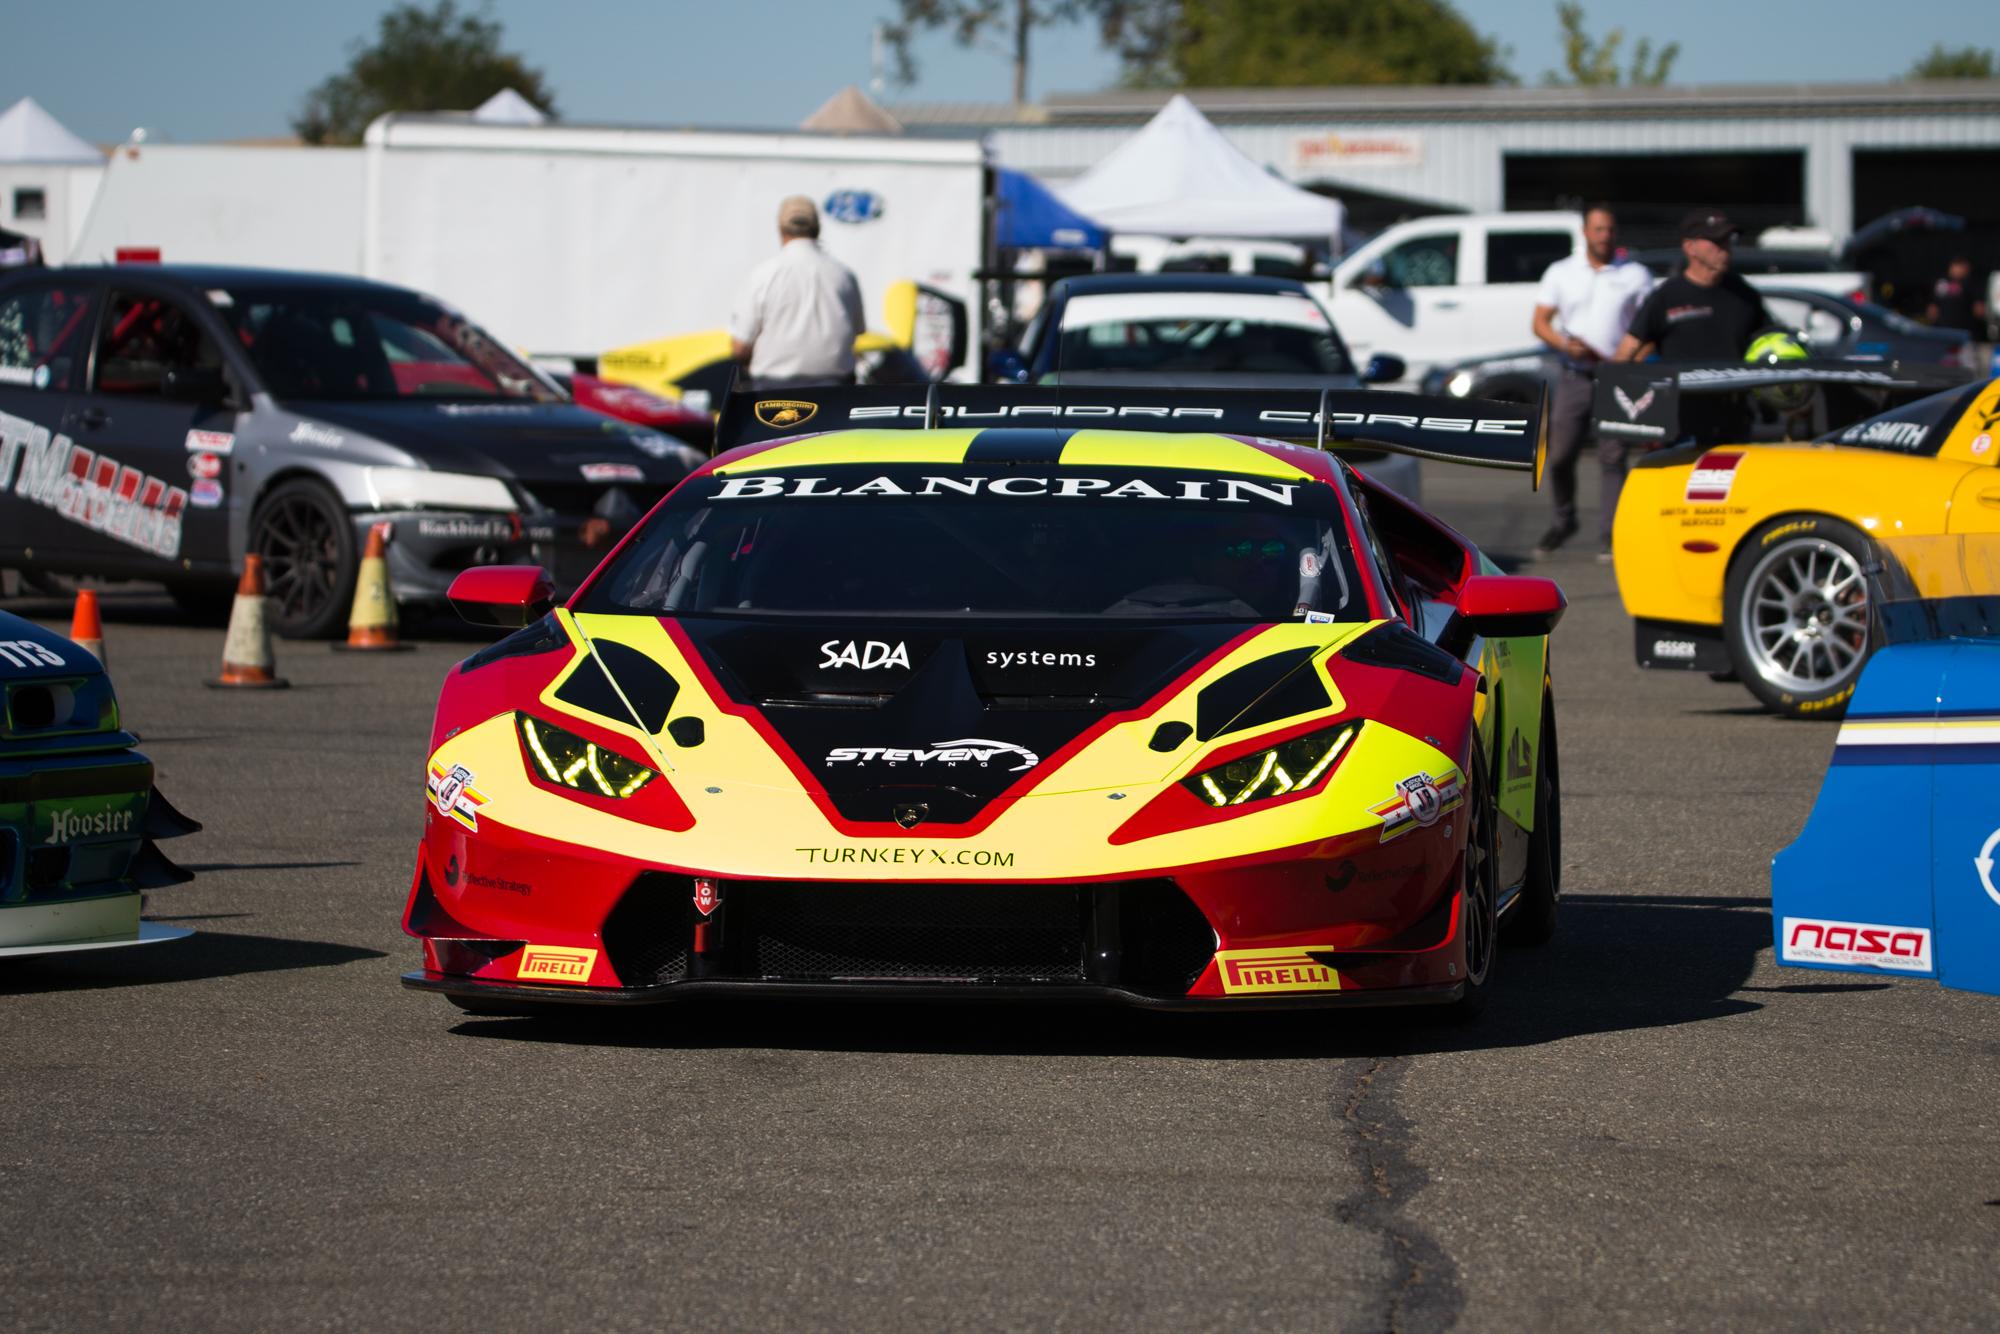 Steven-Racing-20171006-45100.jpg